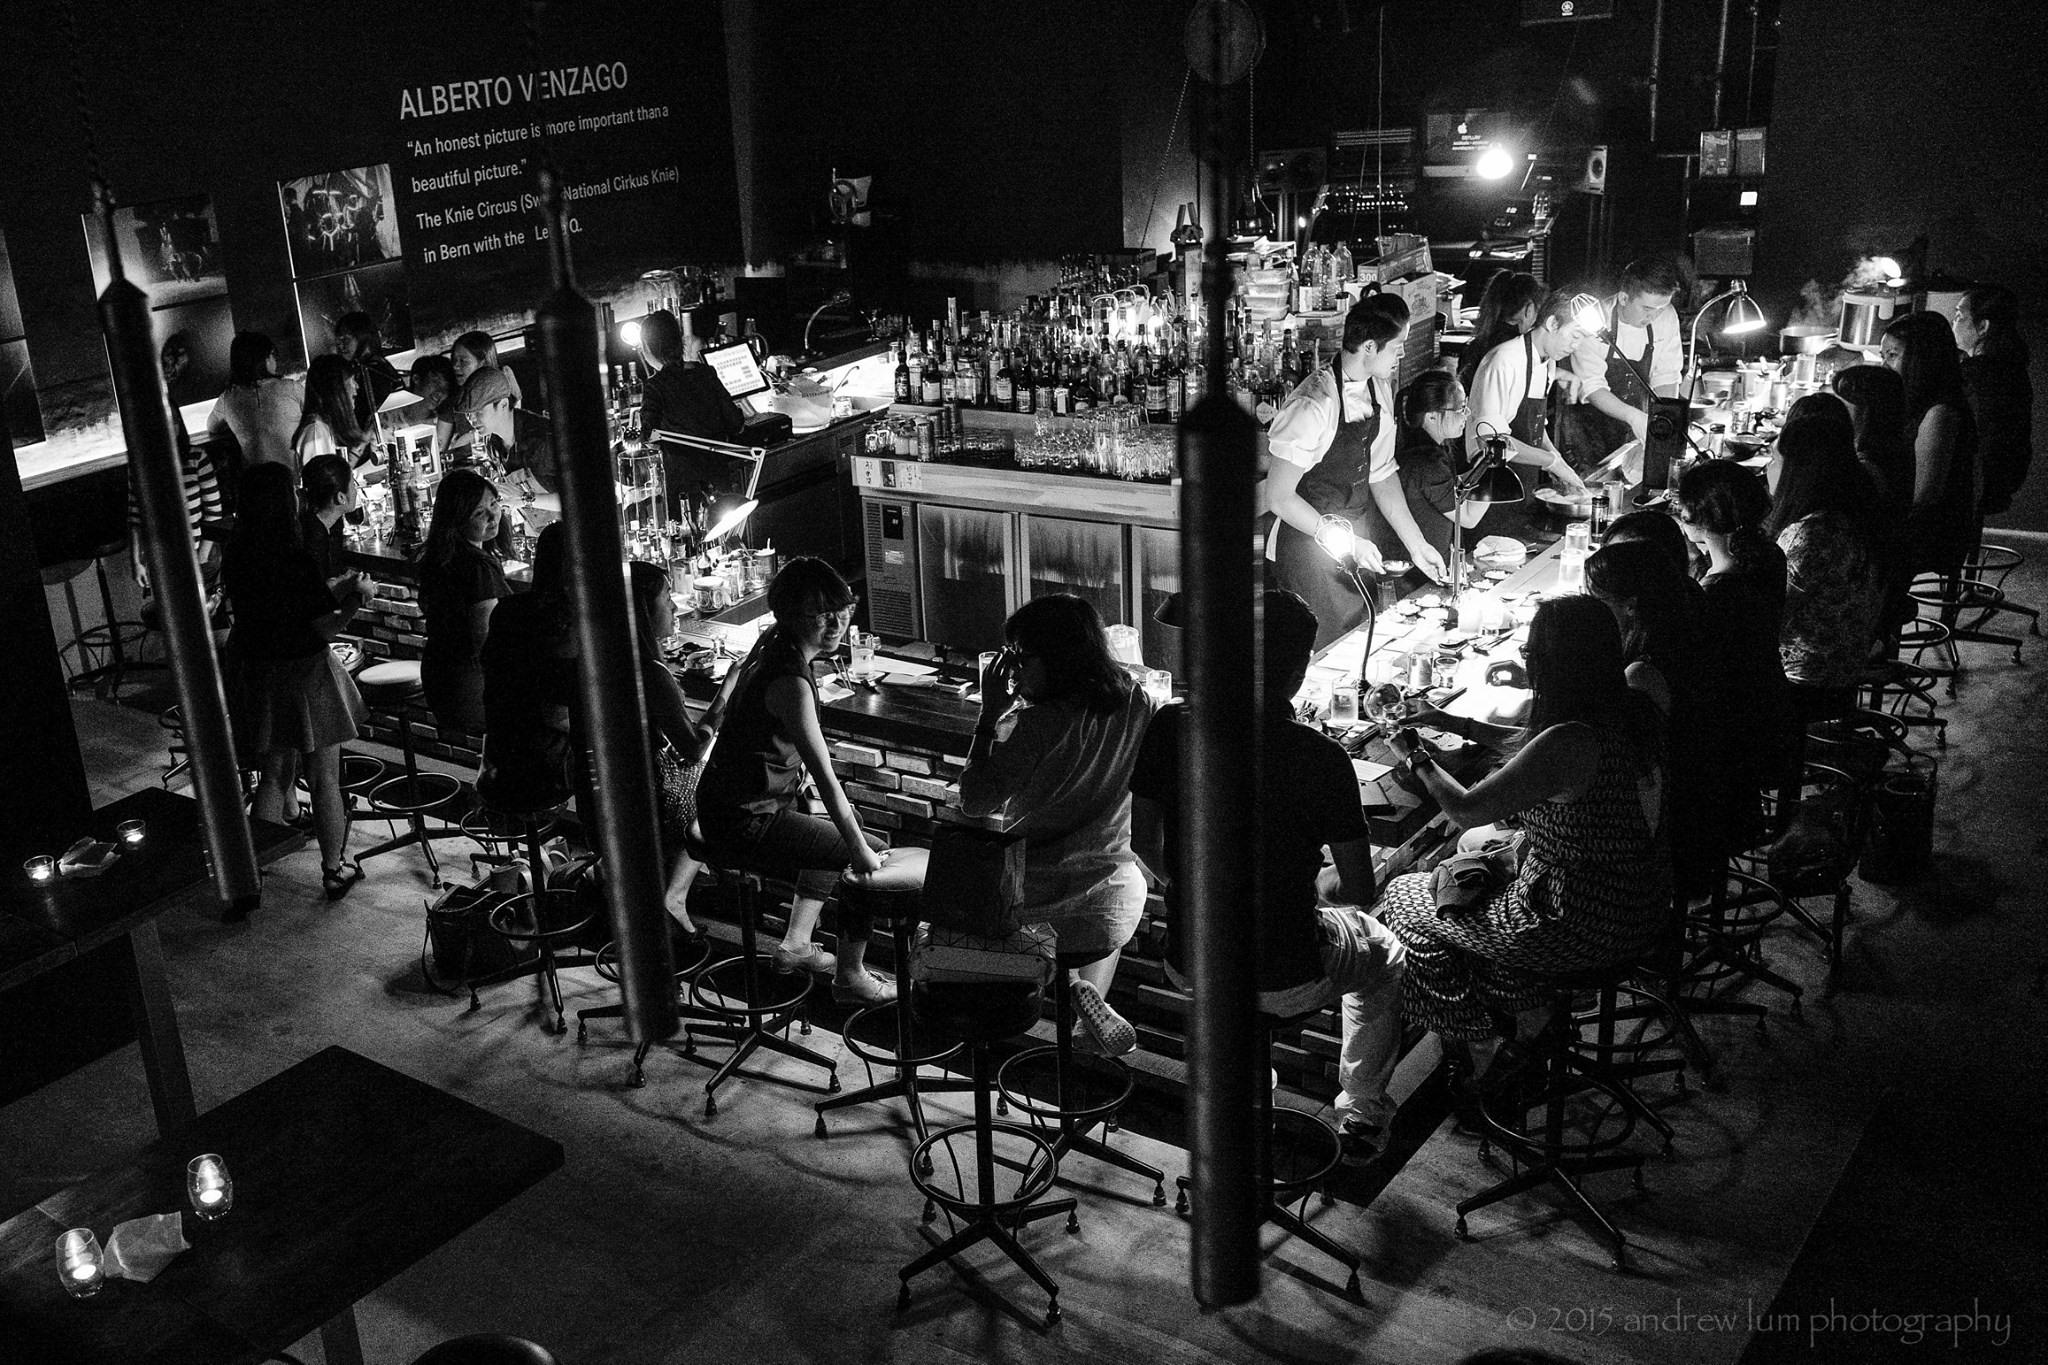 DSTLLRY Bar - Andrew Lum Photography